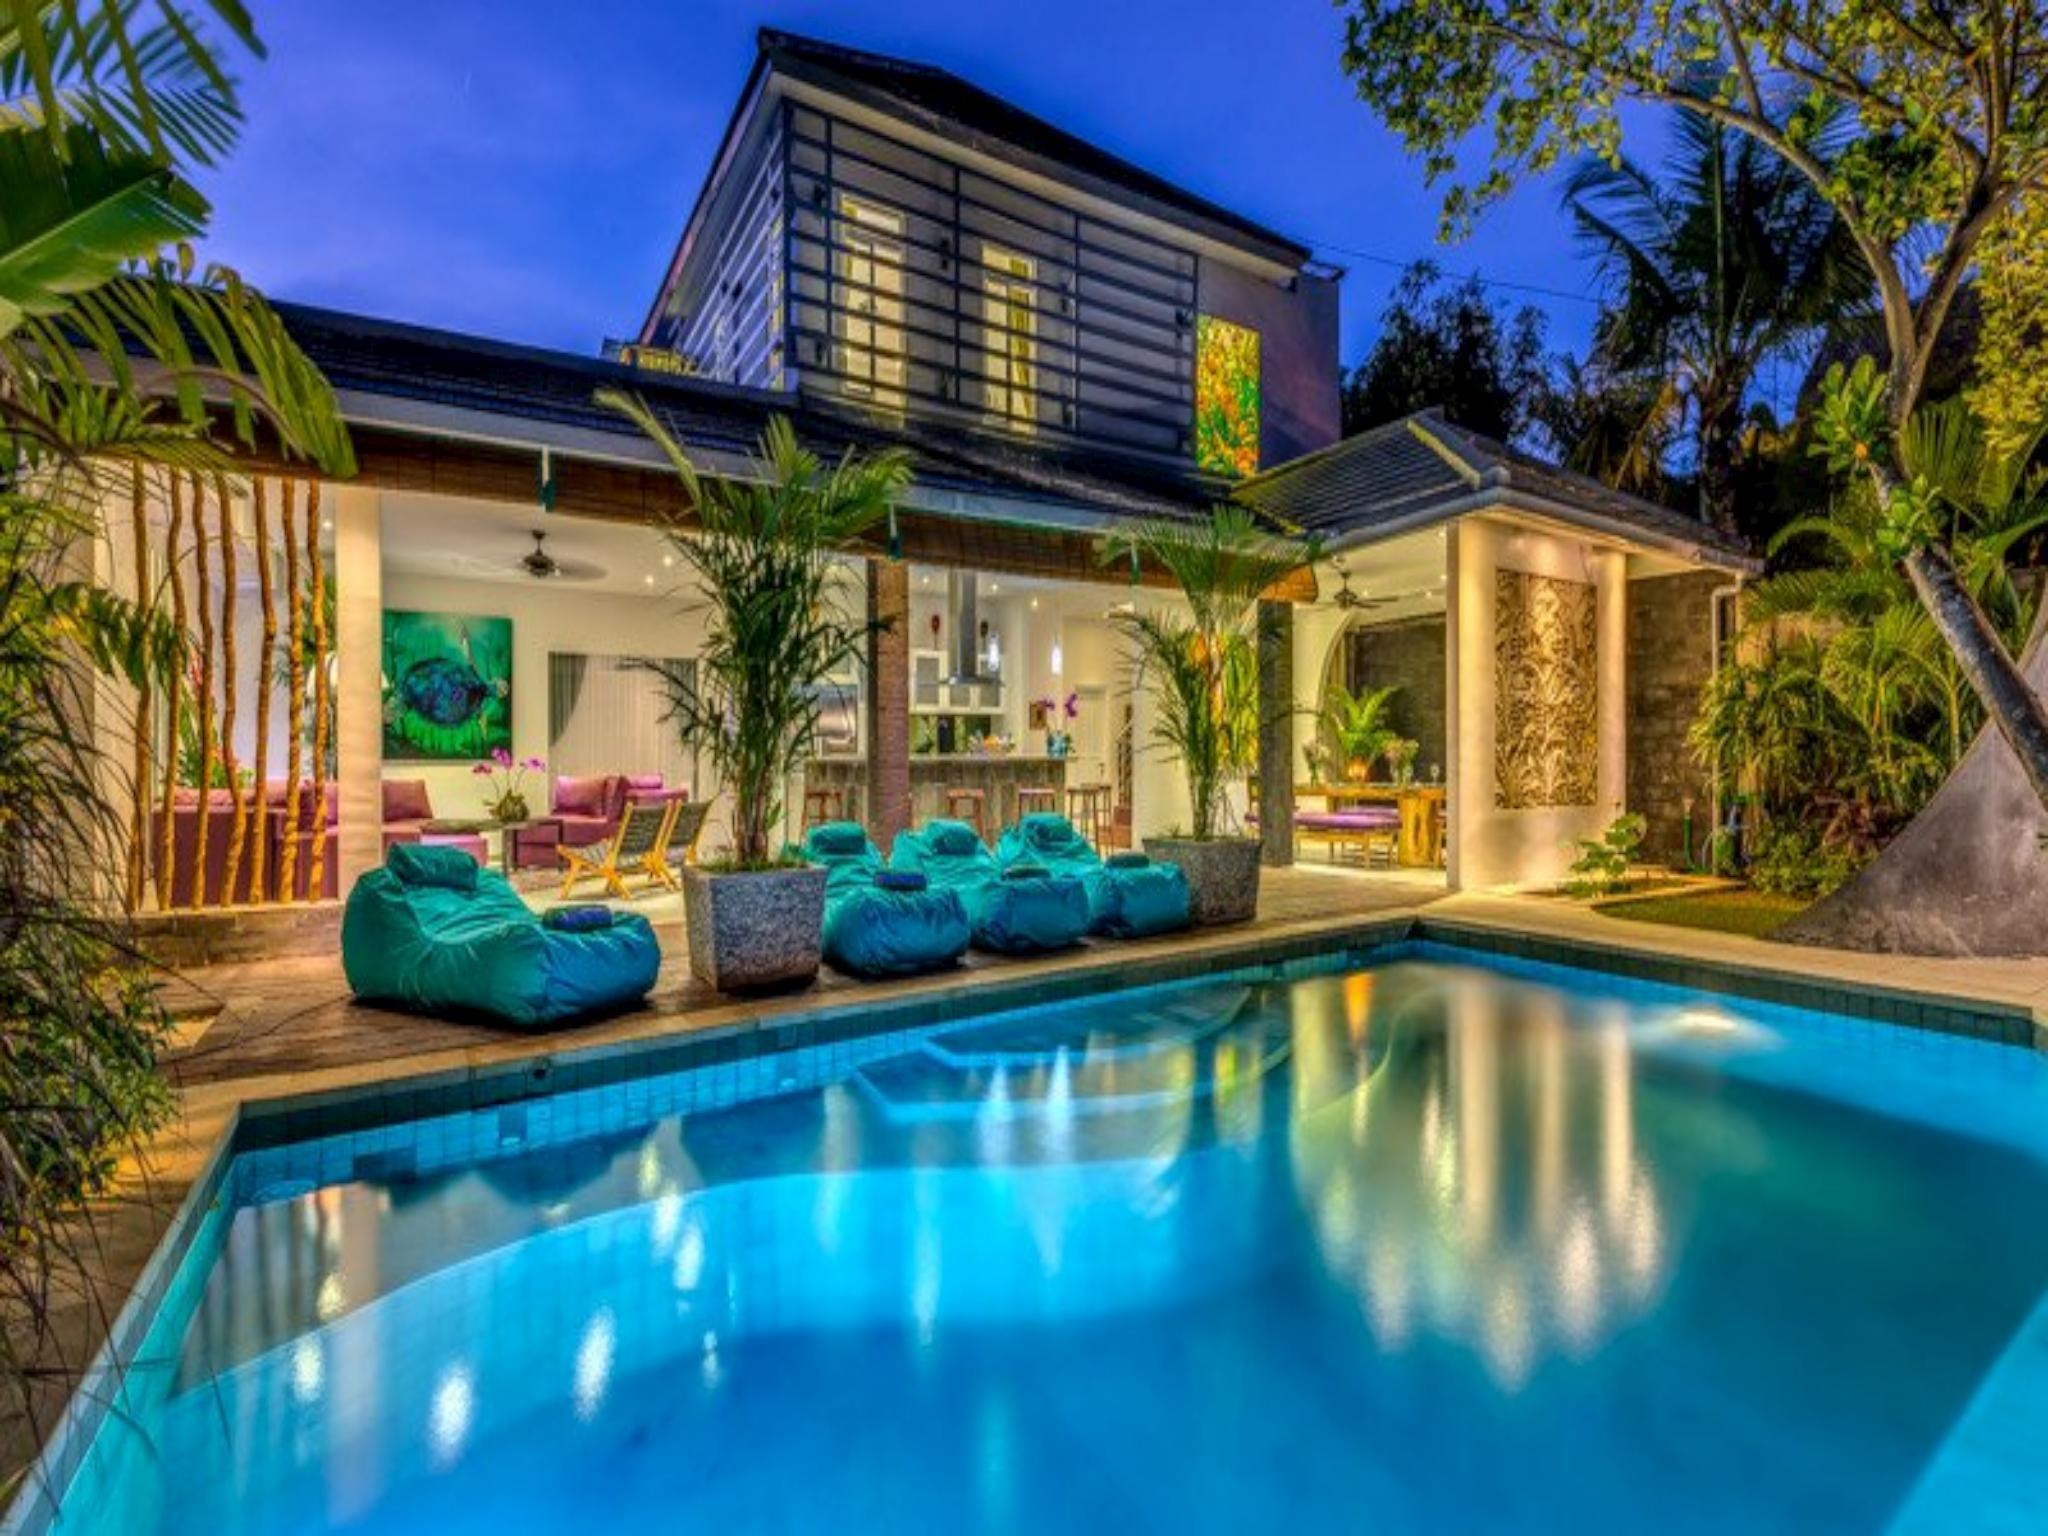 Best Price on Villa Alchemy Seminyak in Bali + Reviews